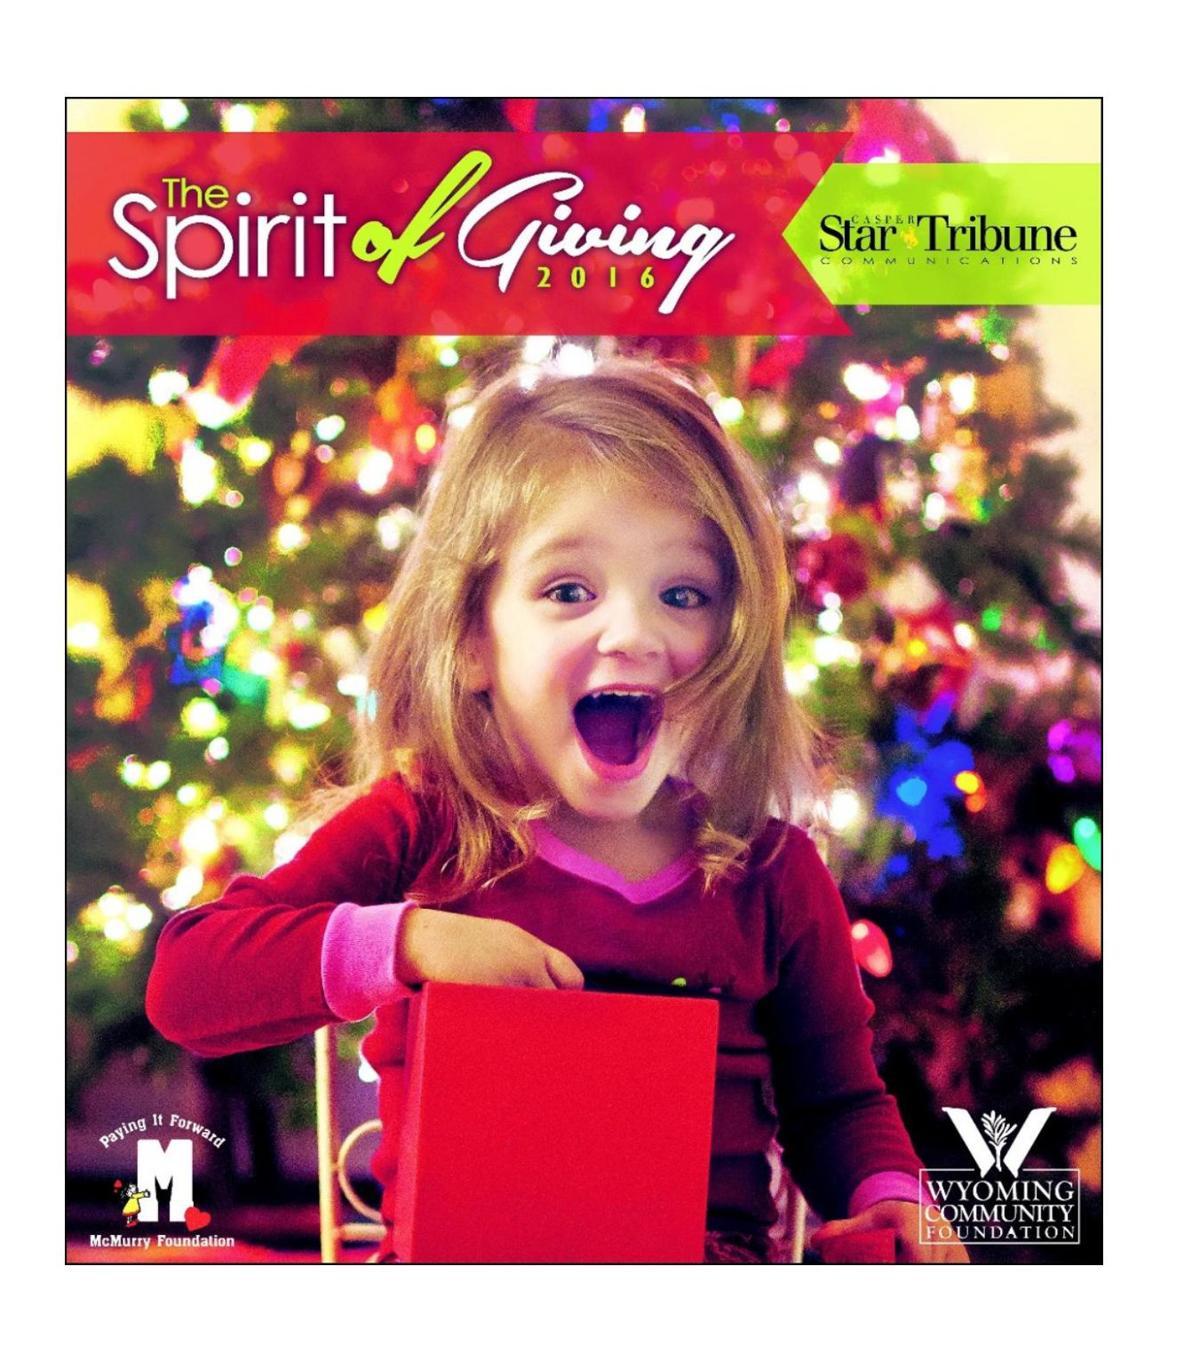 Spirit of Giving, 2016